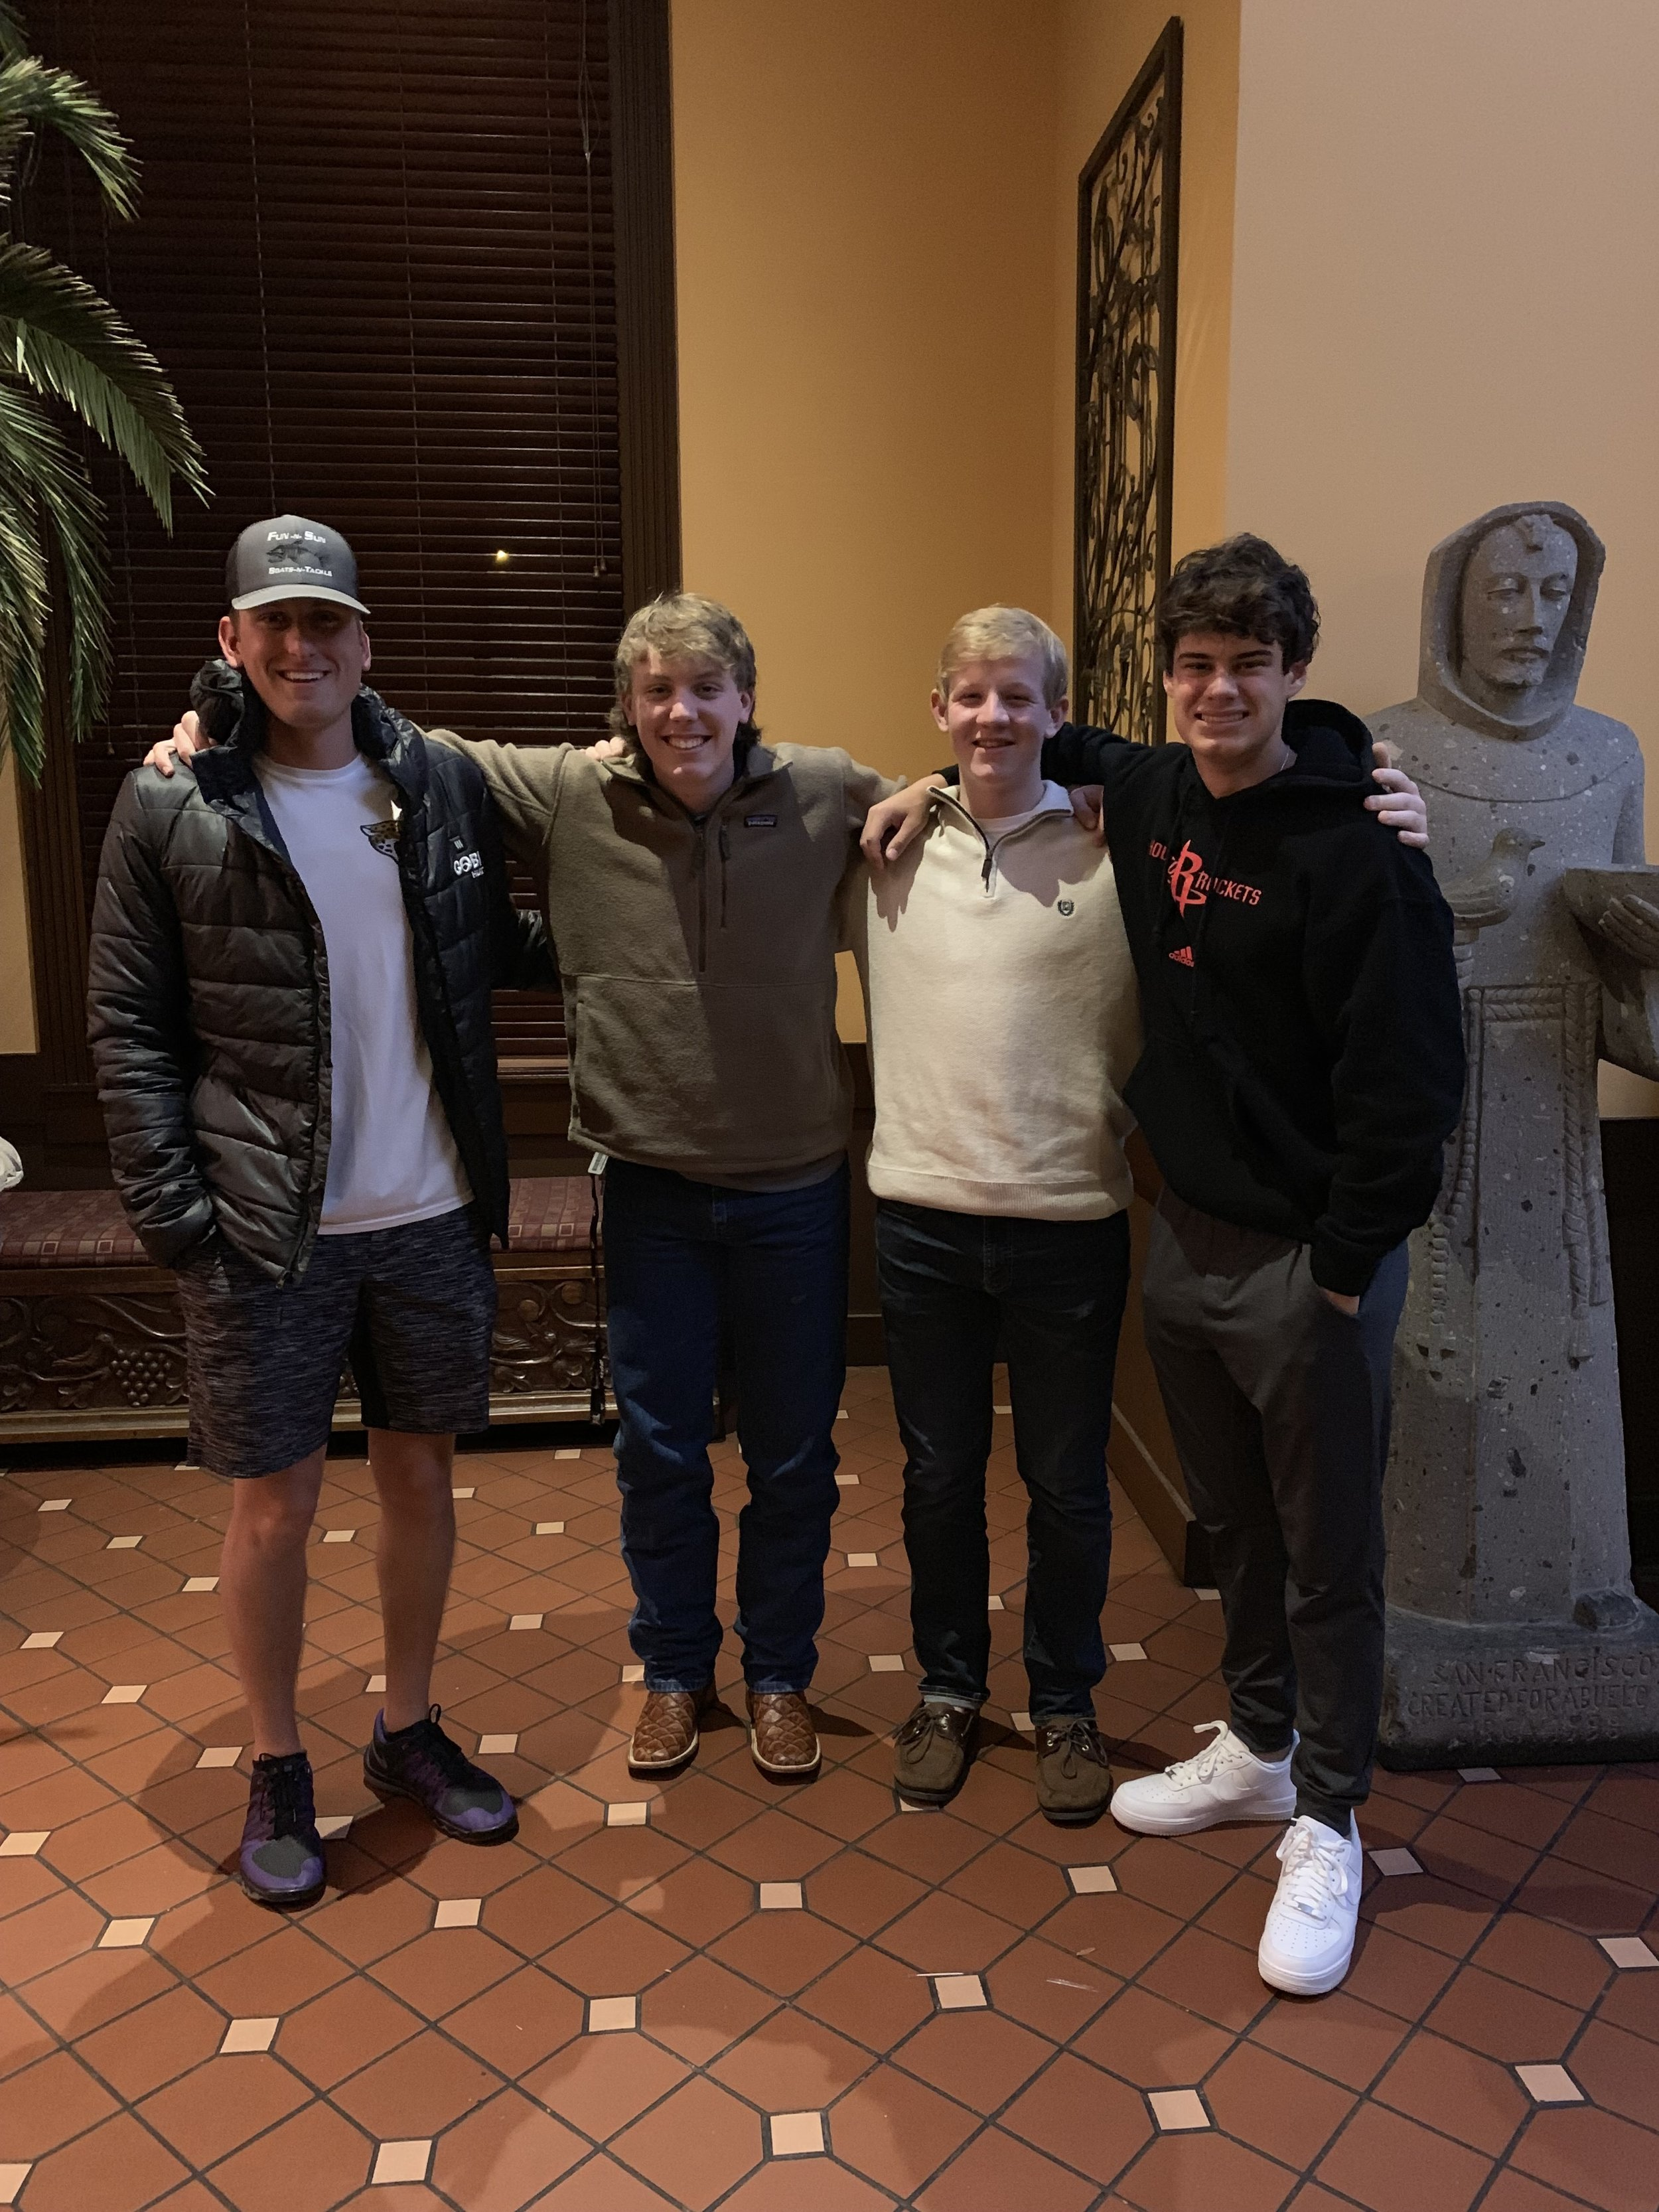 2019 Signees - Griffin Kell - TCUMatt Stanton - UCOJosh Plaster - Arizona State